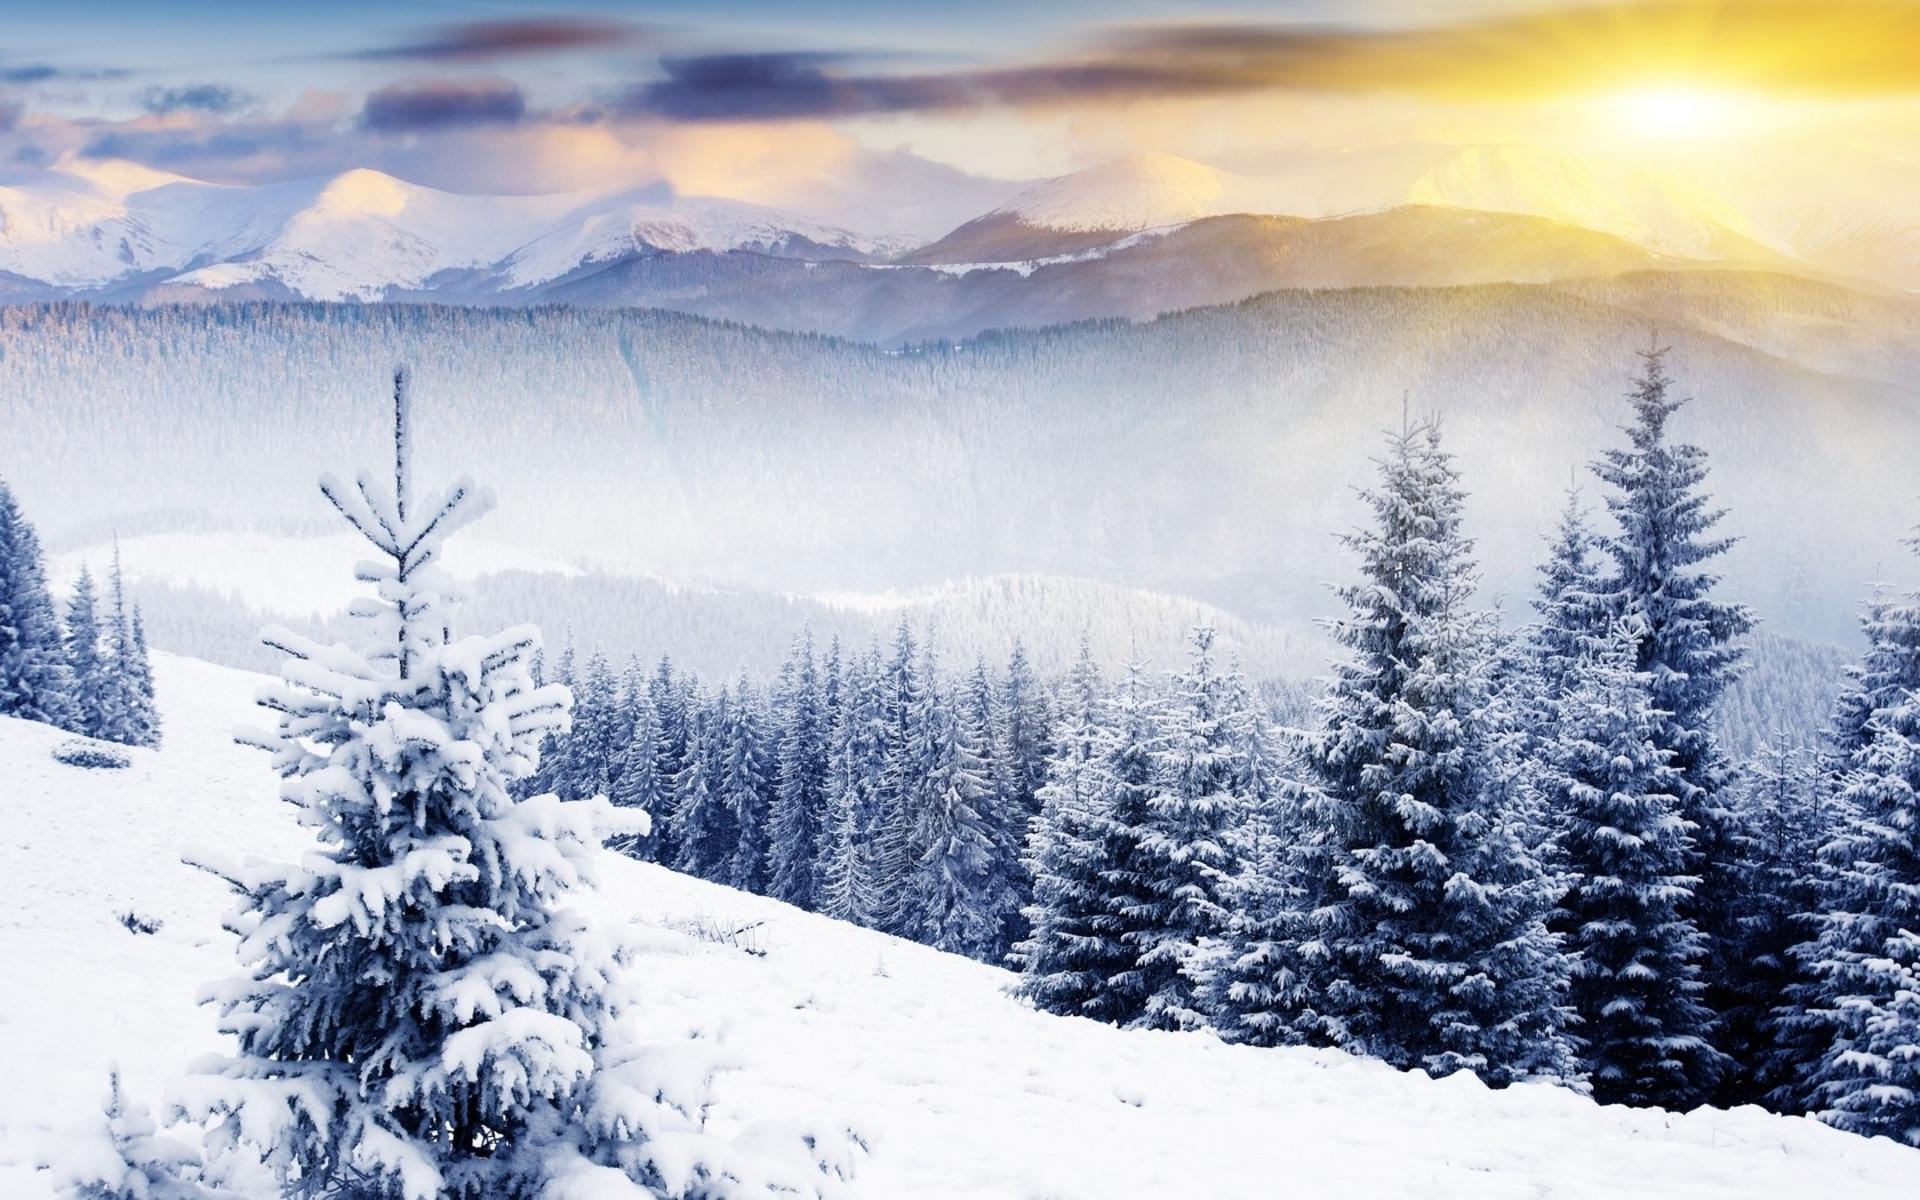 Winter Scenery #6877240.